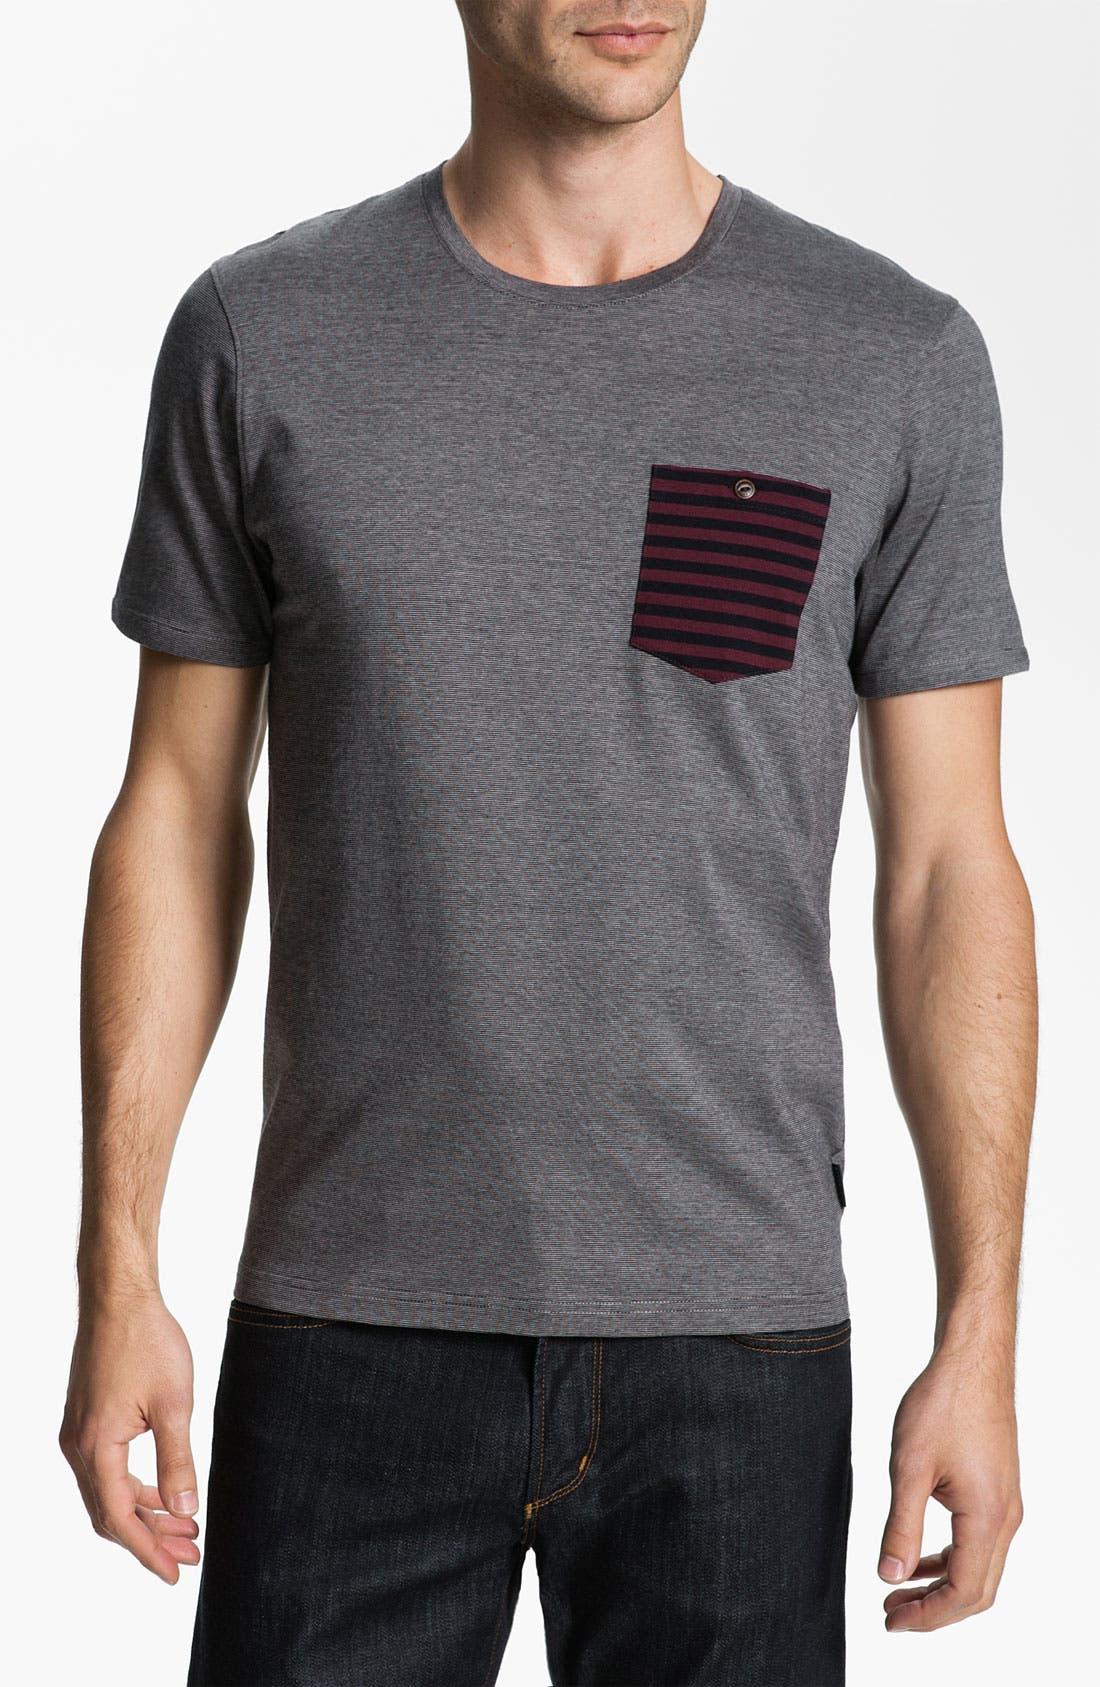 Alternate Image 1 Selected - Ted Baker London 'Ohyes' Crewneck T-Shirt